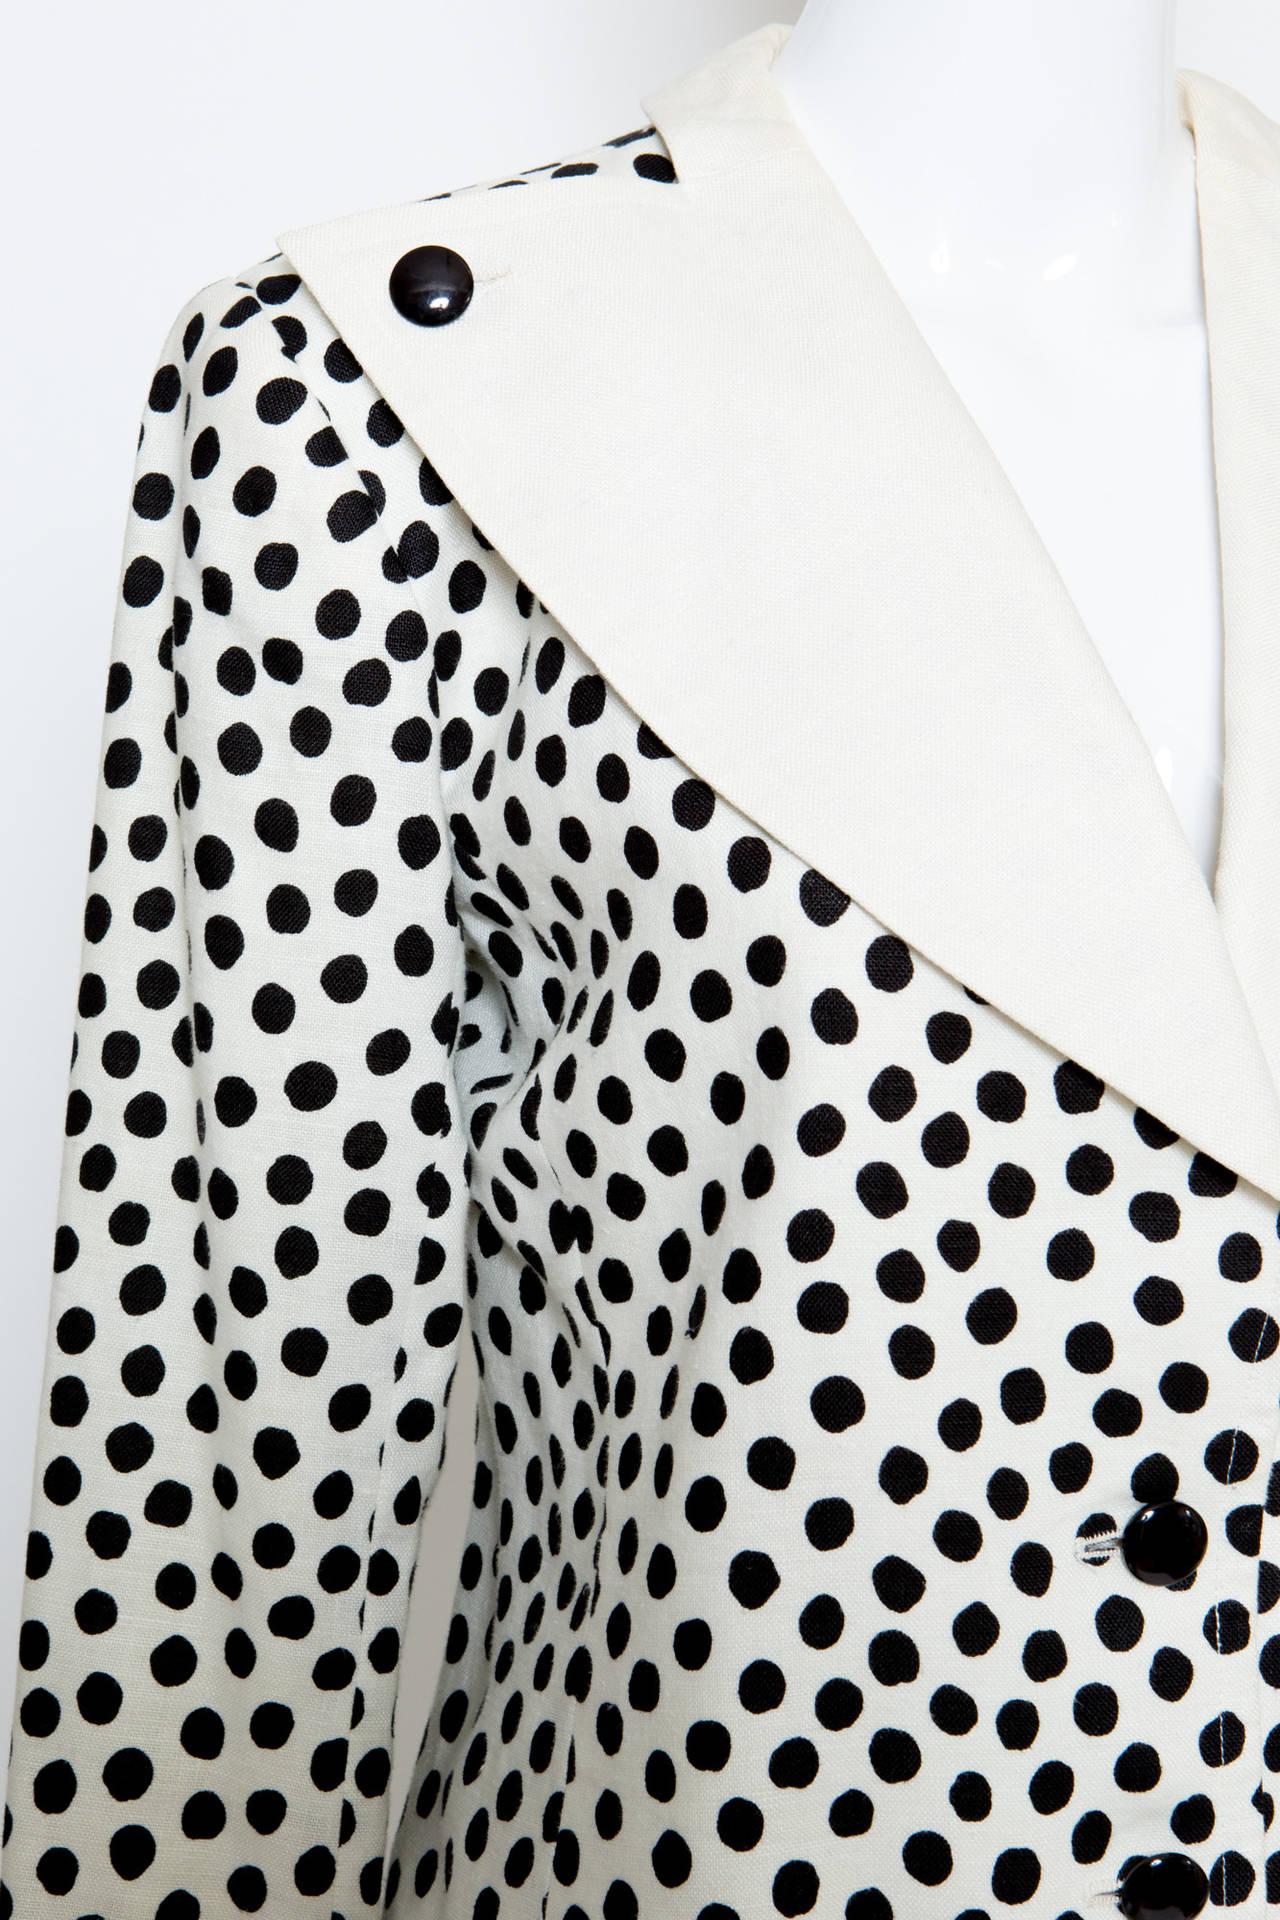 Women's 1980s Yves Saint Laurent Black and White Jacket For Sale